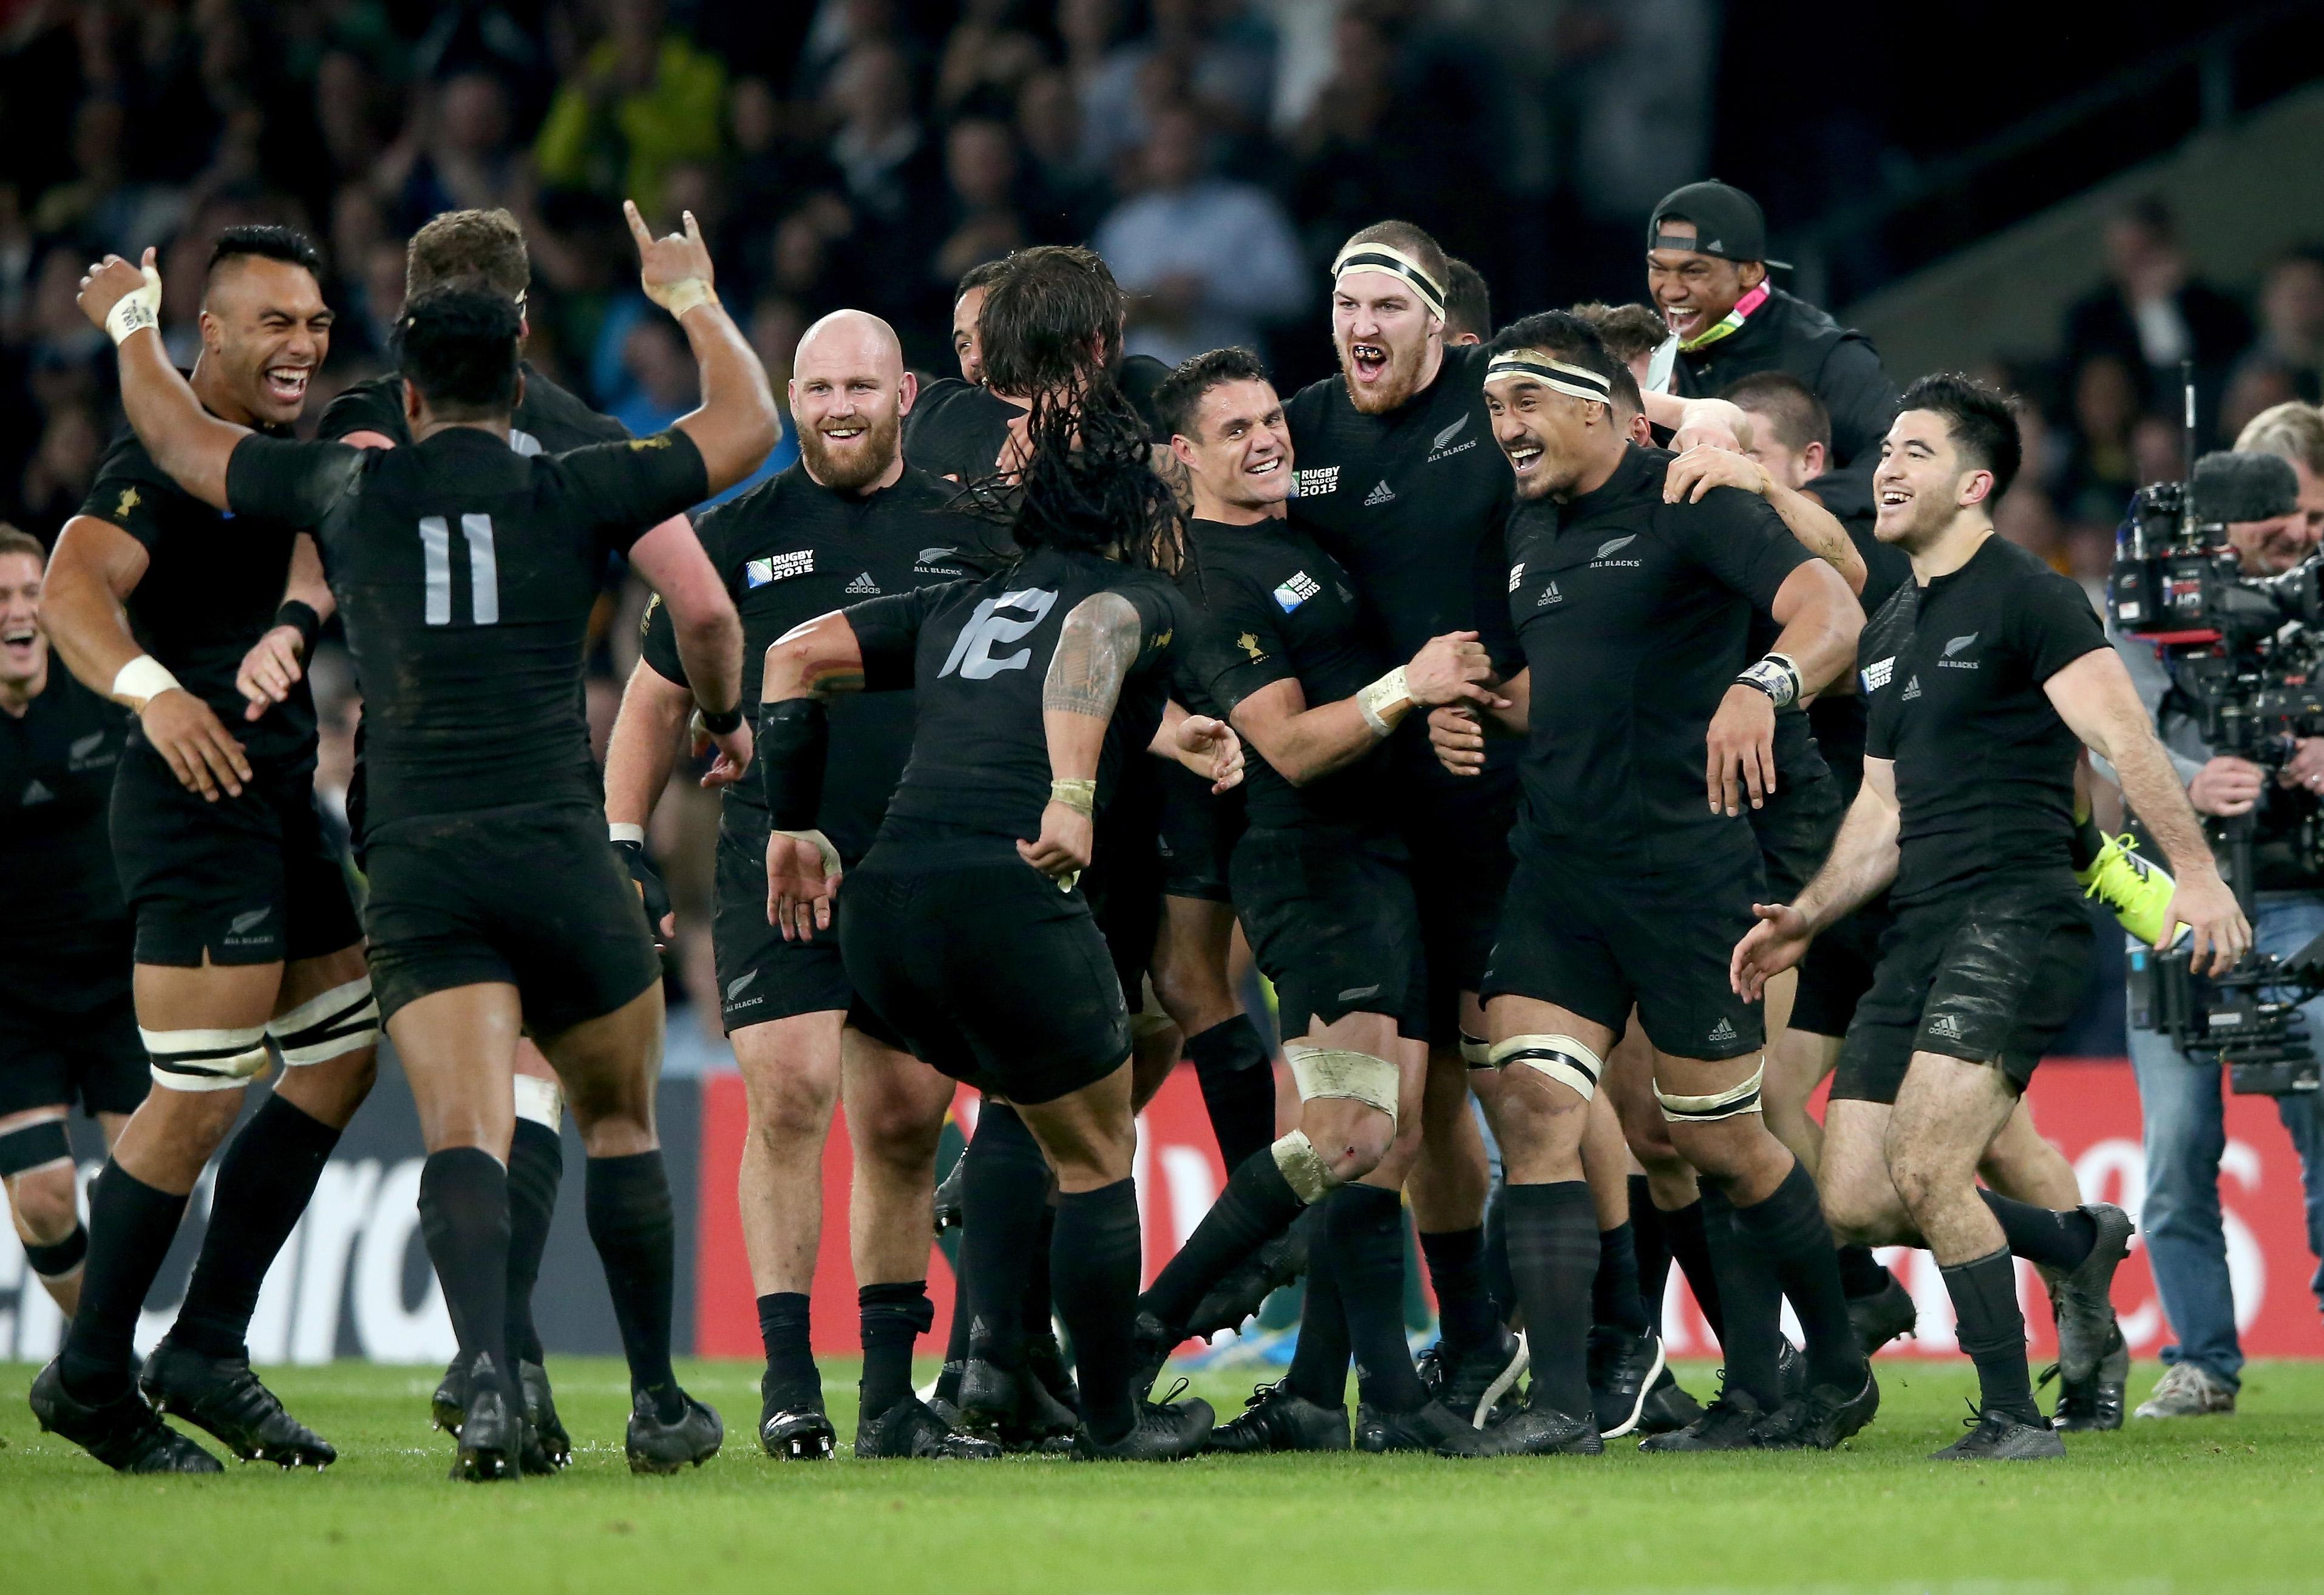 rugby wm finale 2019